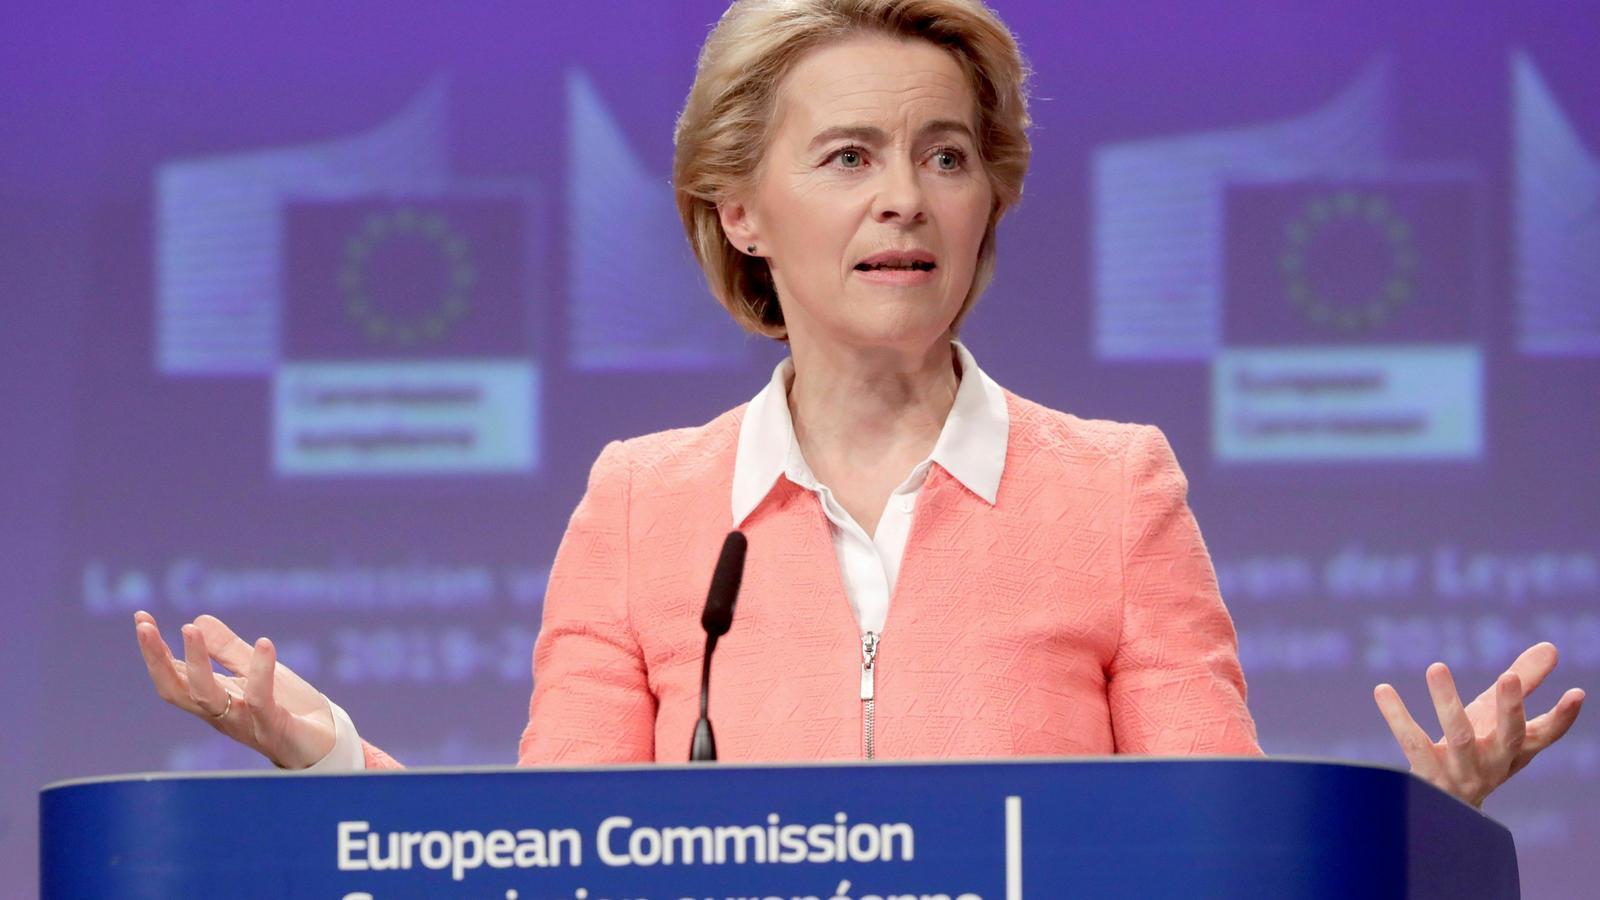 La futura presidenta de la Comissió Europea, Ursula Von der Leyen